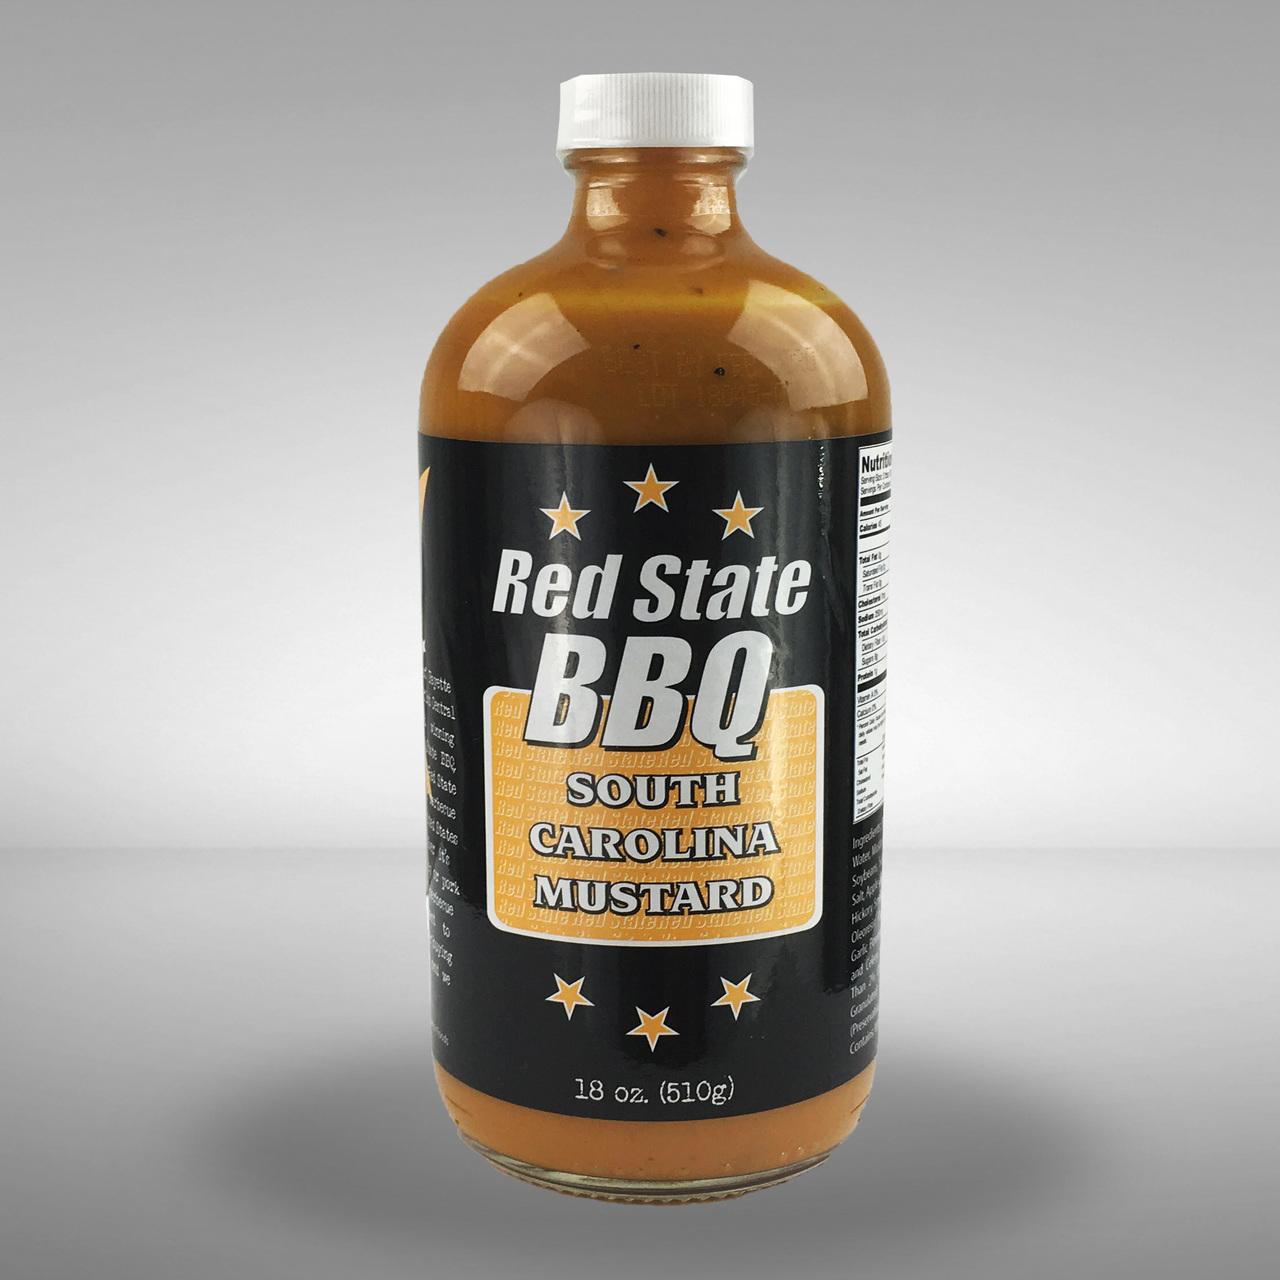 South Carolina Mustard